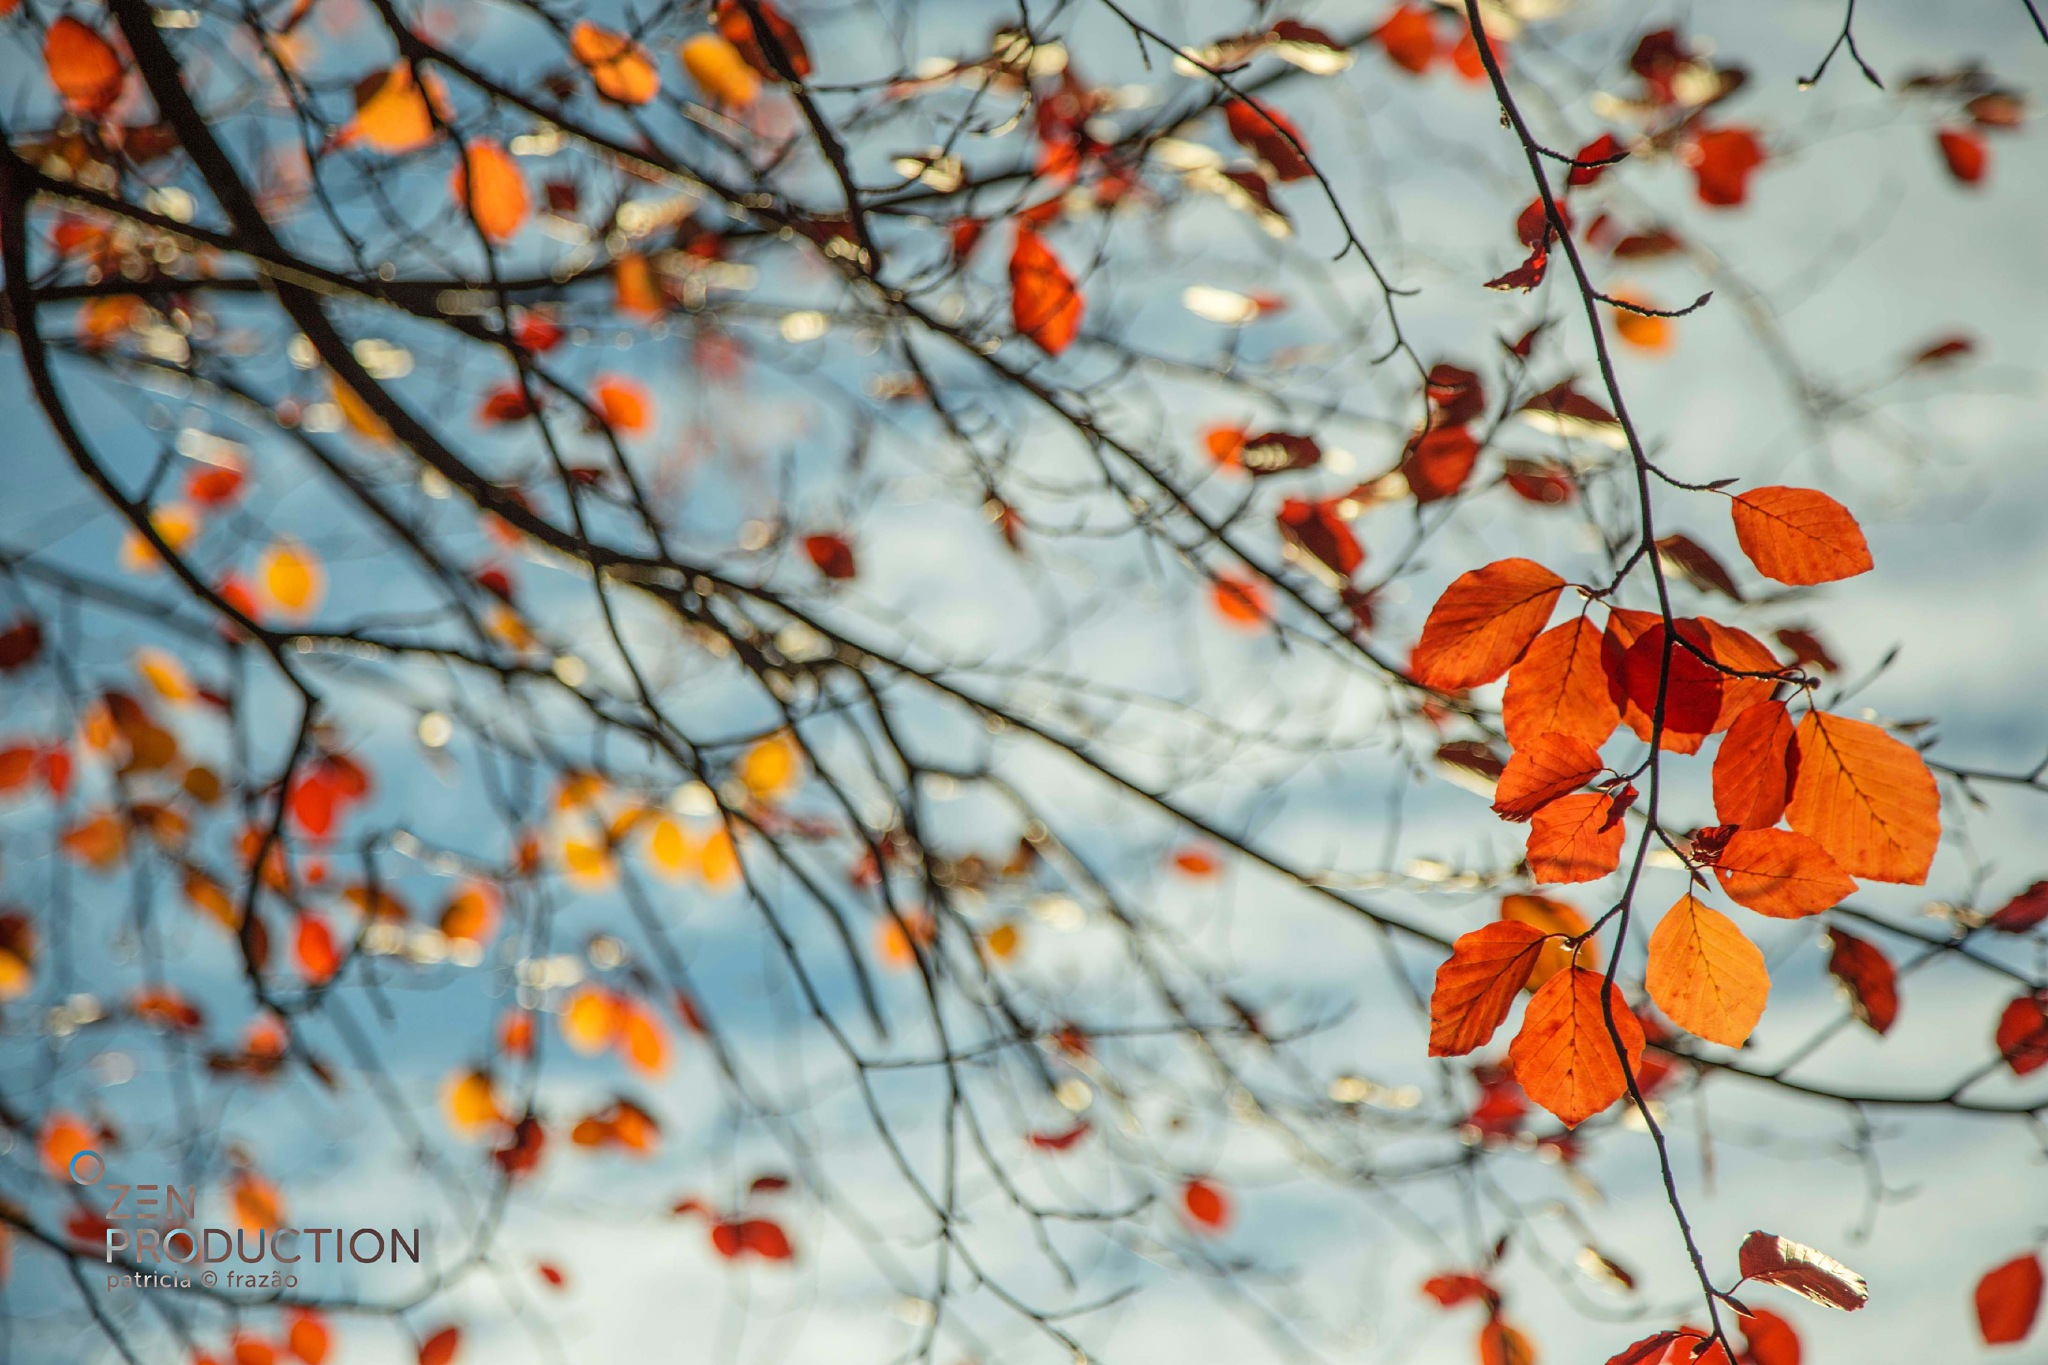 The end of Fall by Patricia Frazão